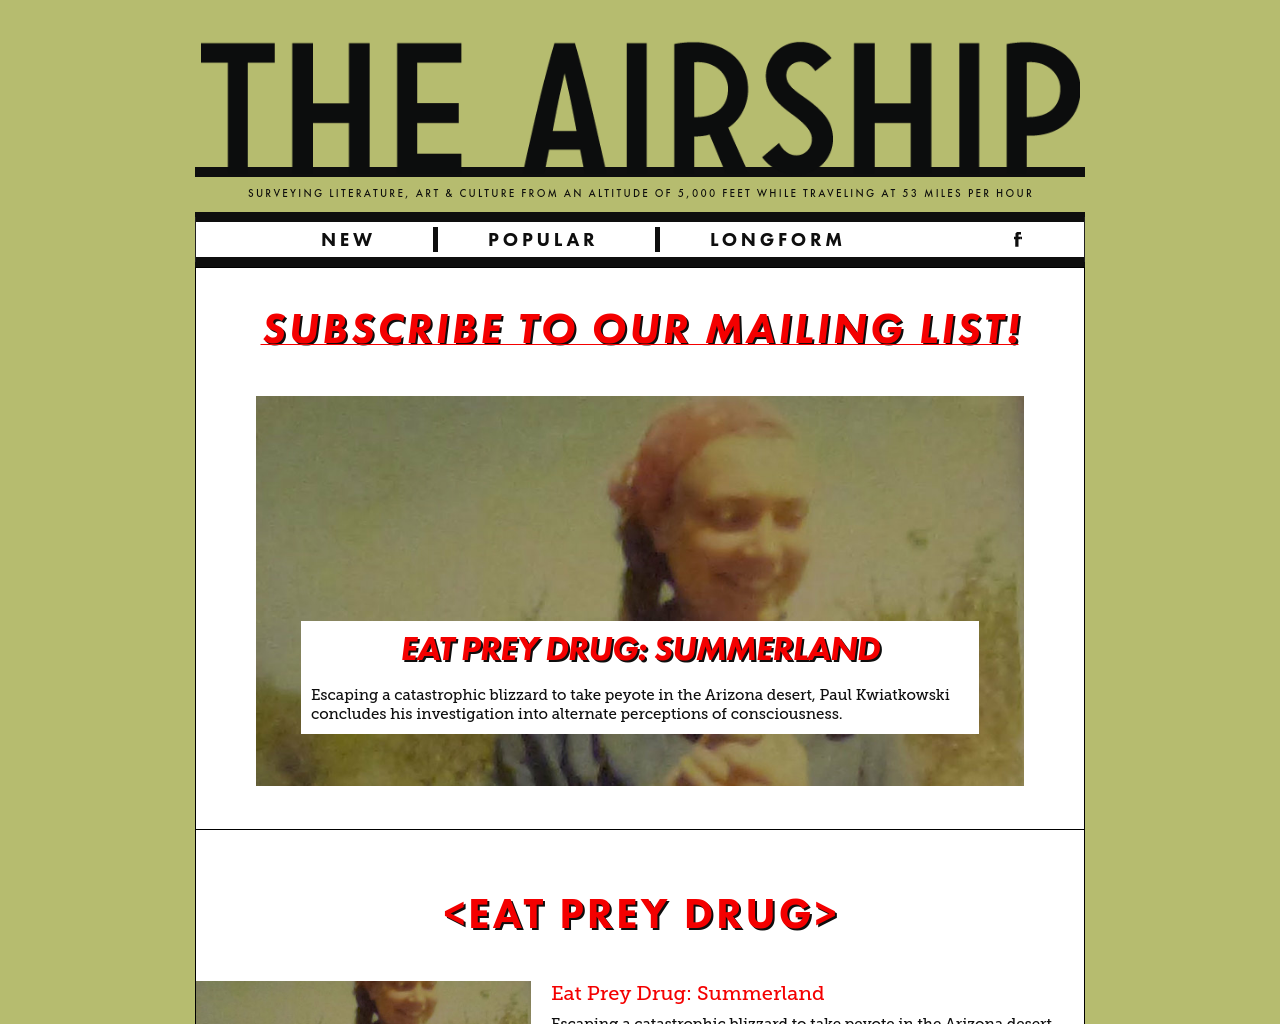 The-Airship-Advertising-Reviews-Pricing